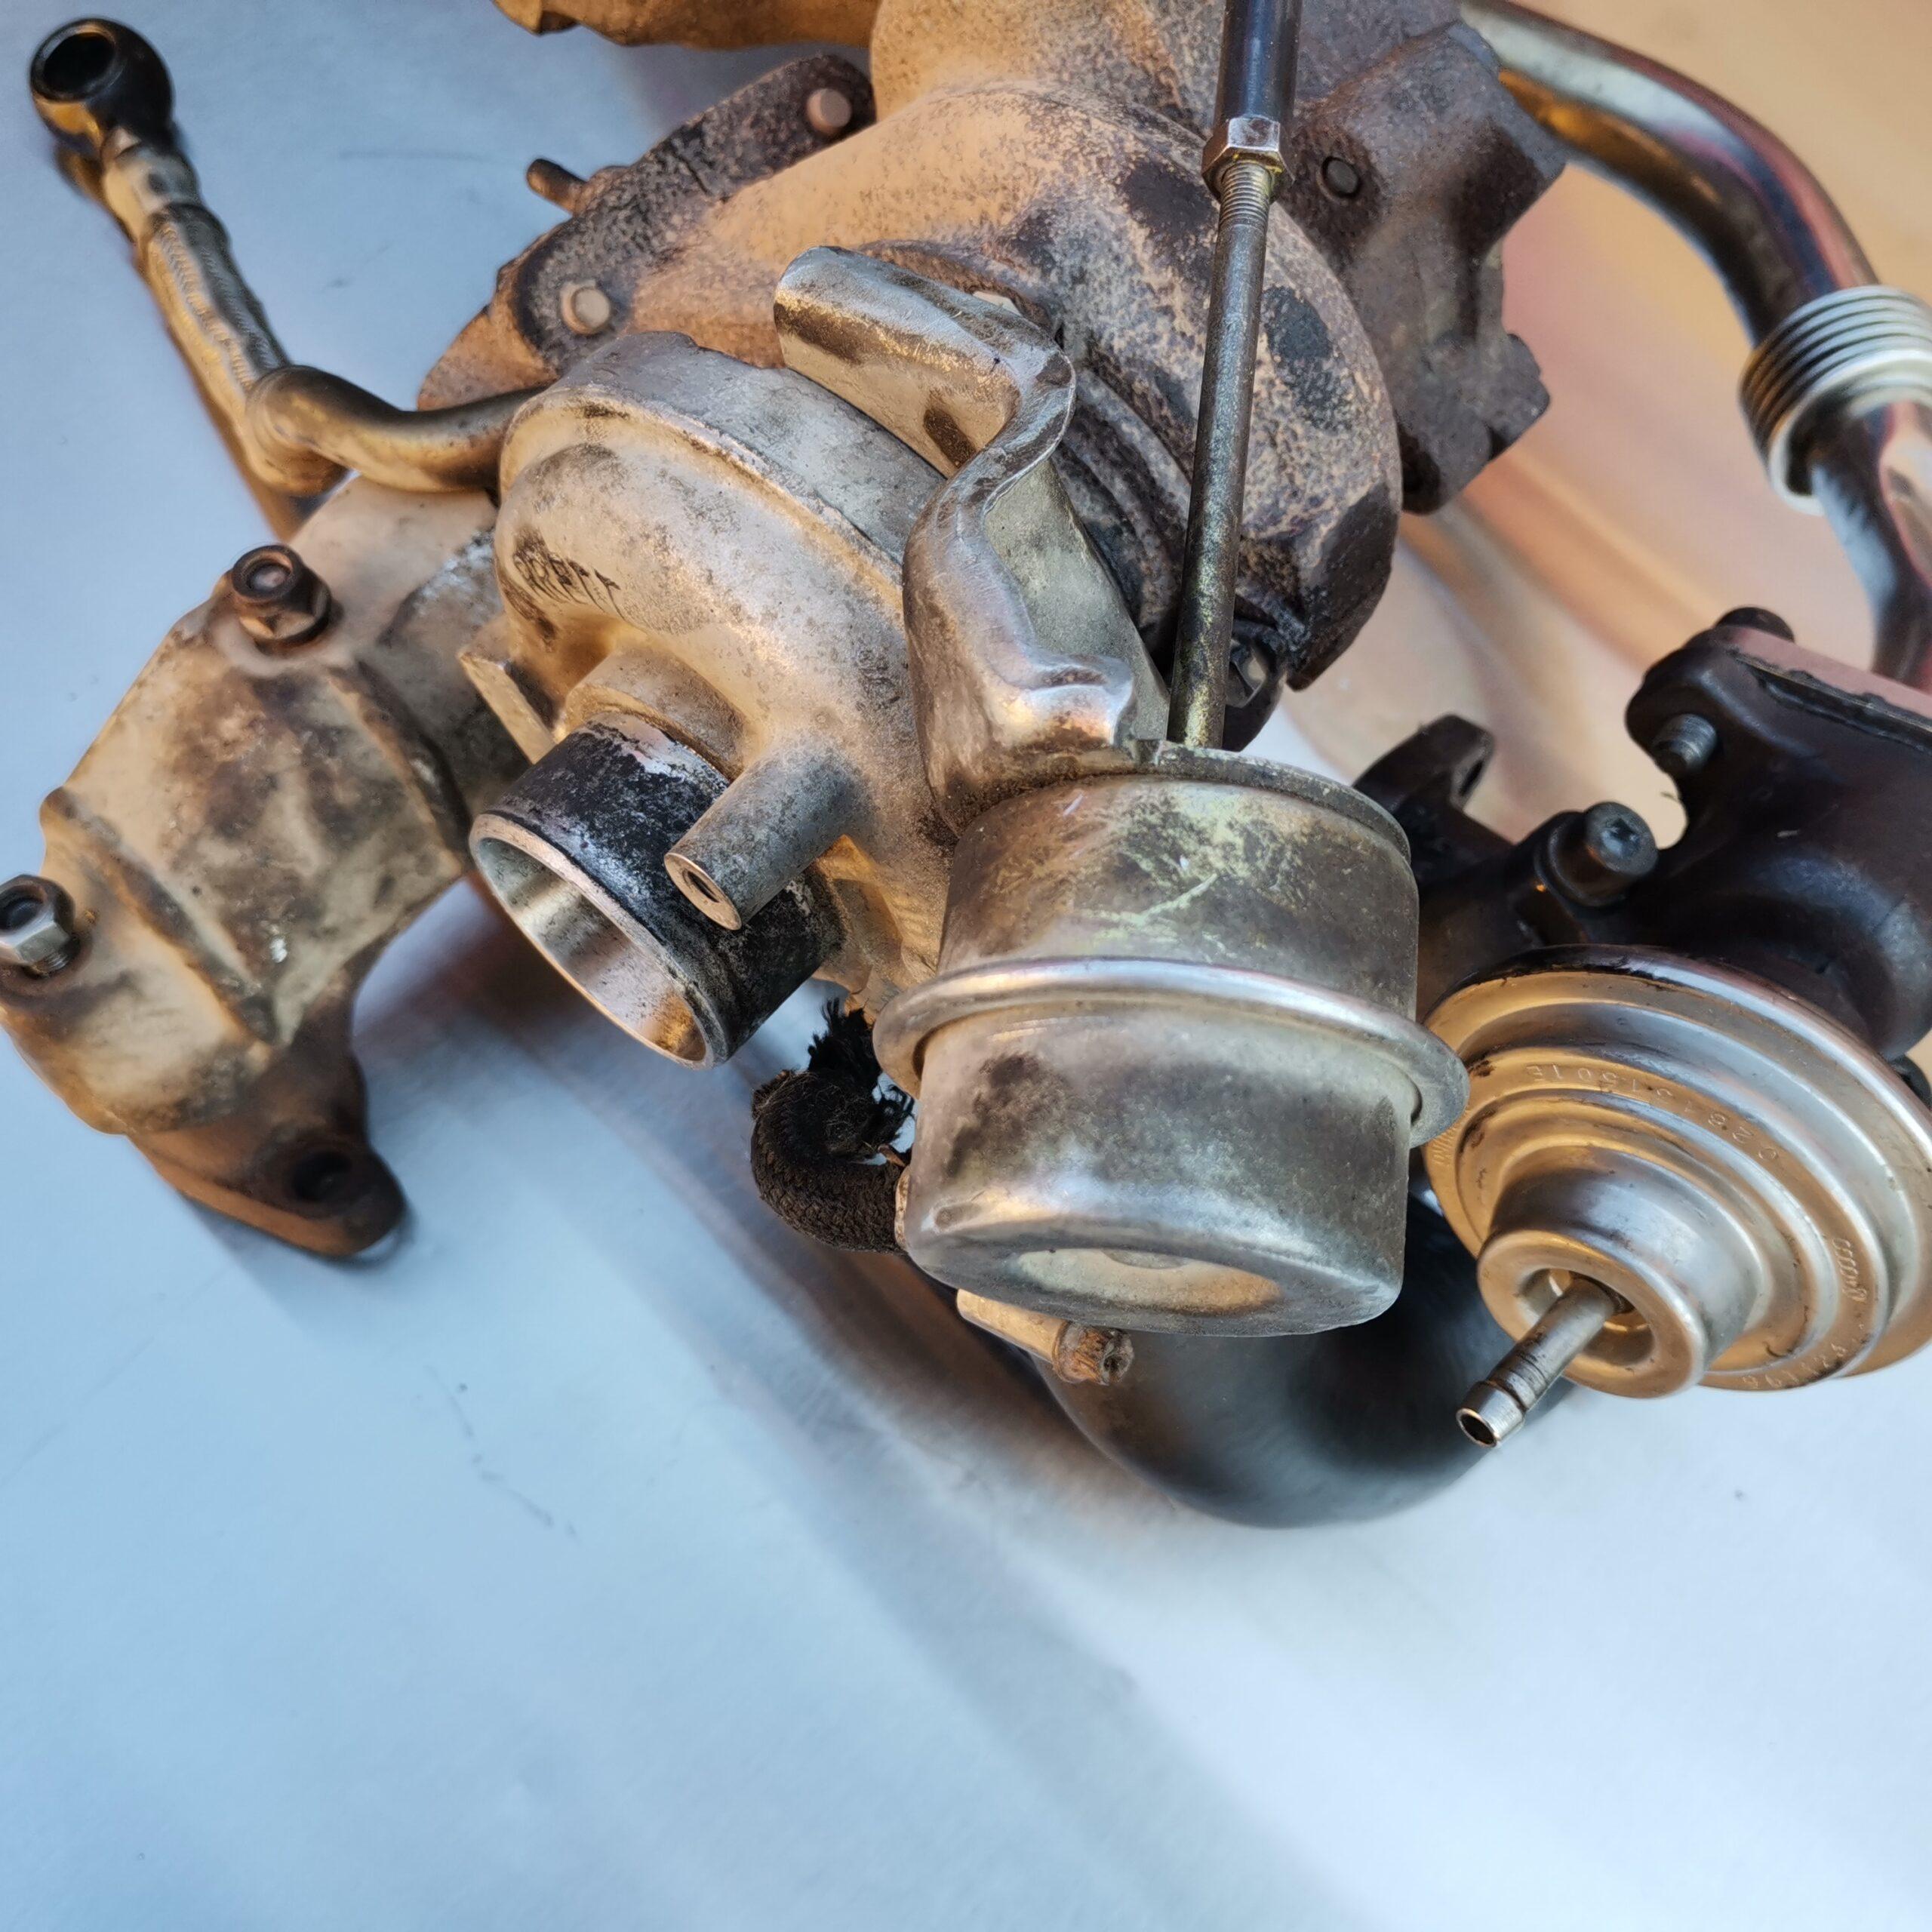 Фото турбокомпрессора Volkswagen Transporter до ремонта